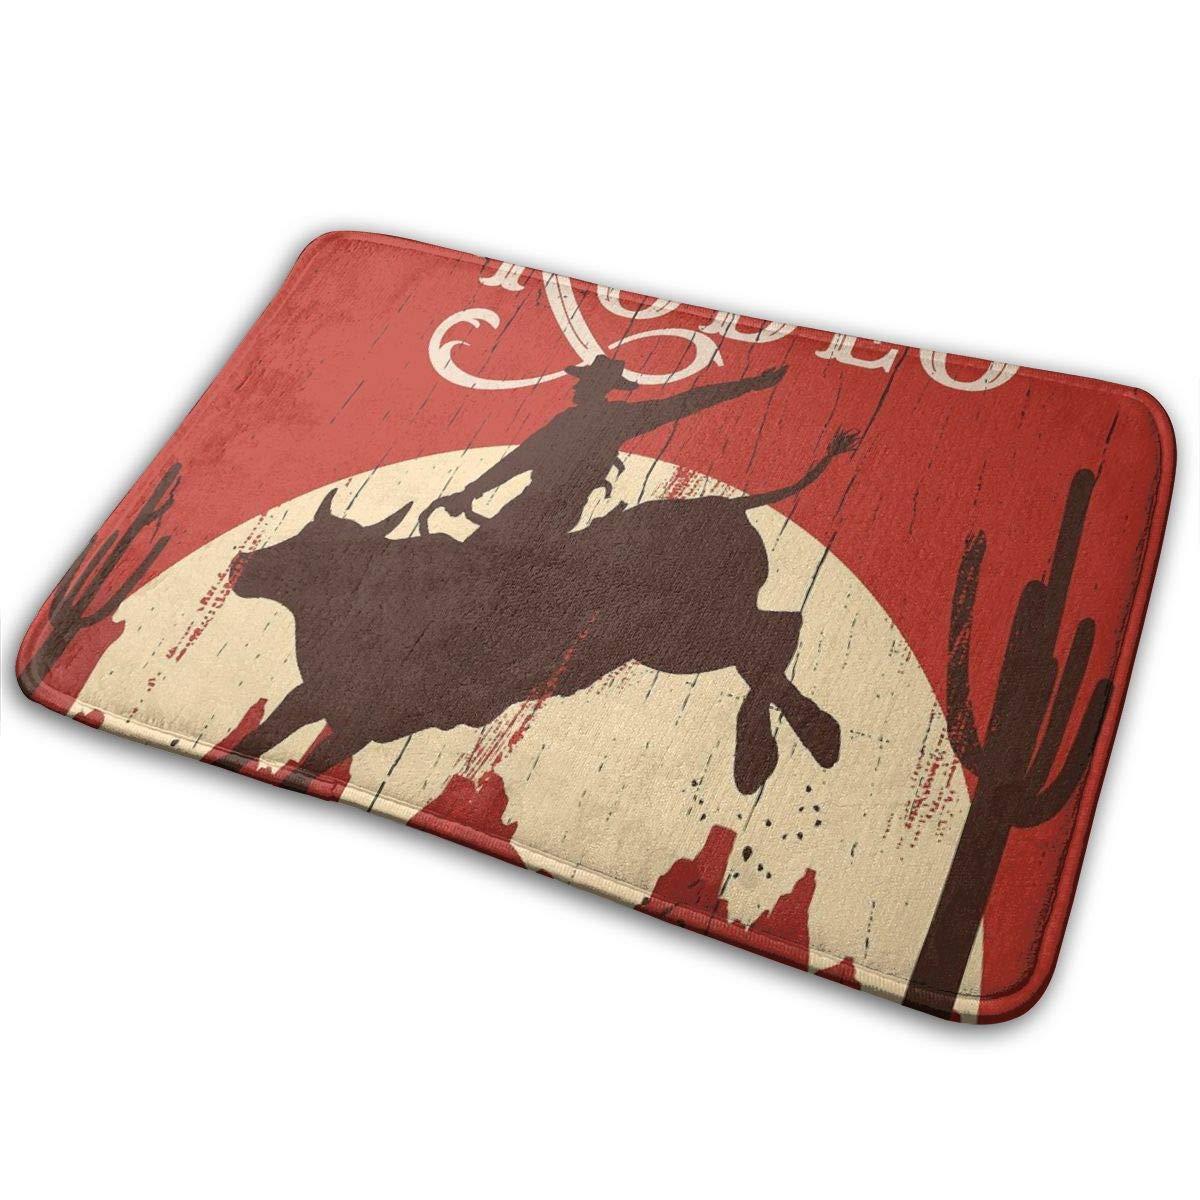 Westen Cowboy Cow Skull On Rock Bathroom Mat Door Rug Home Decor Carpet Non-Slip